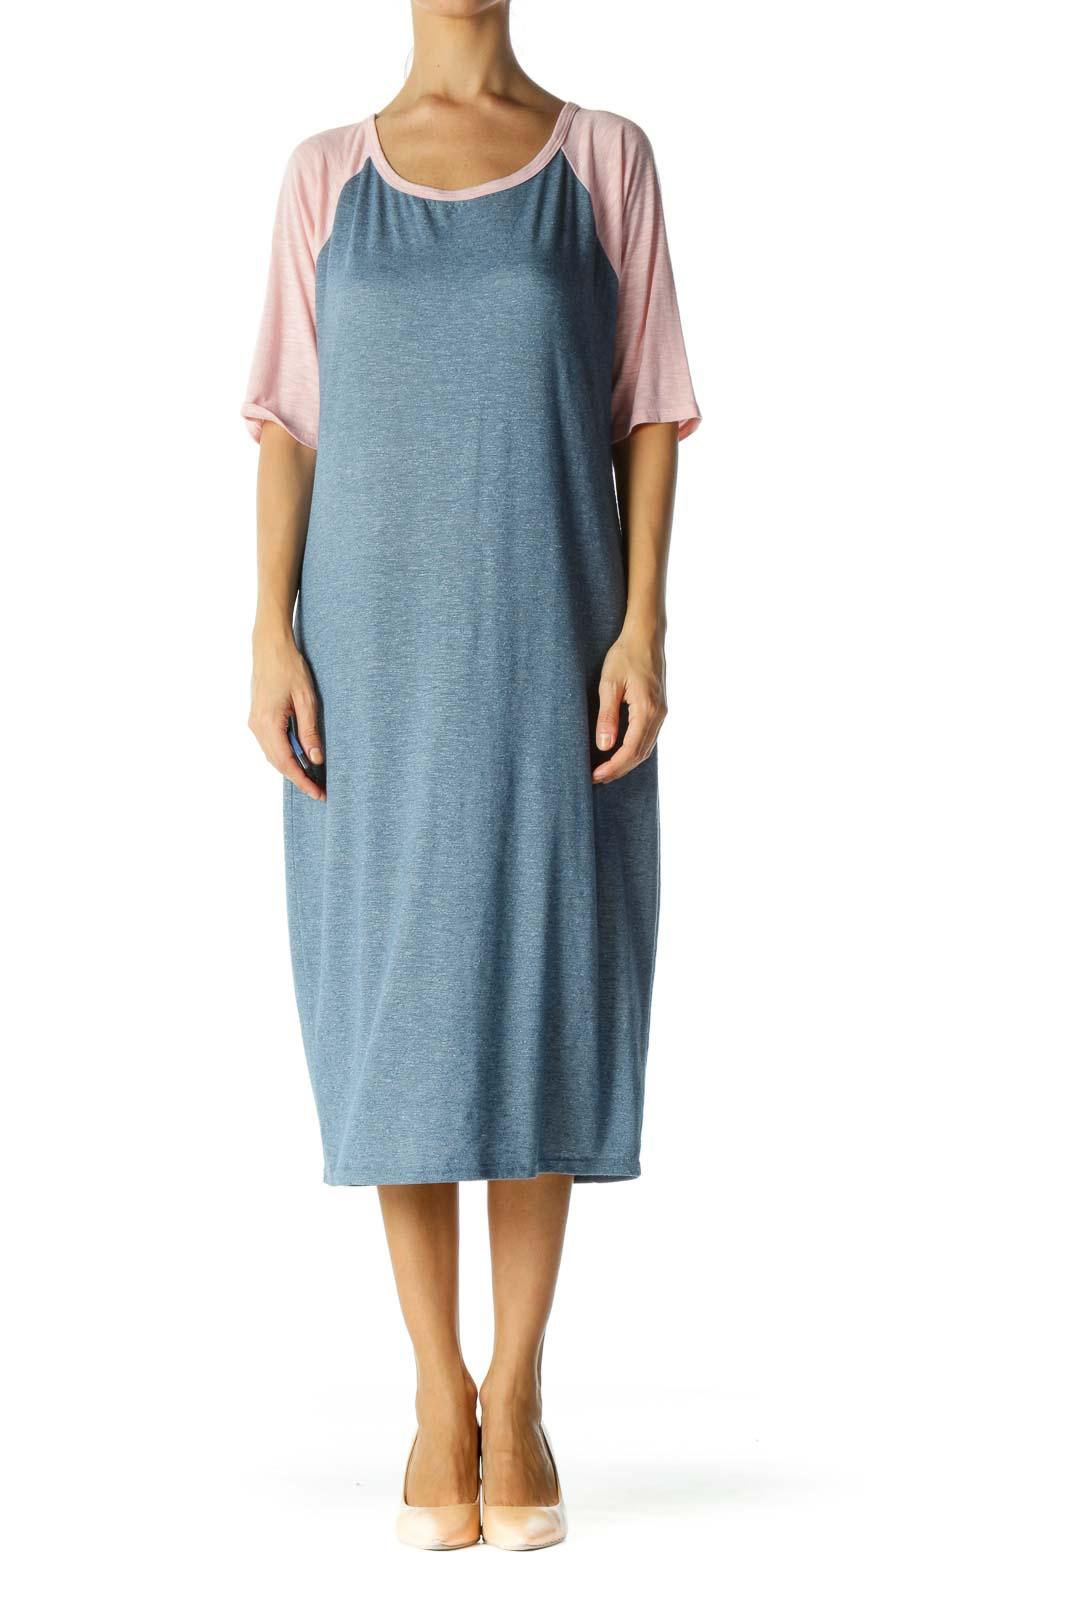 Blue&Pink Color Block Shirt Dress